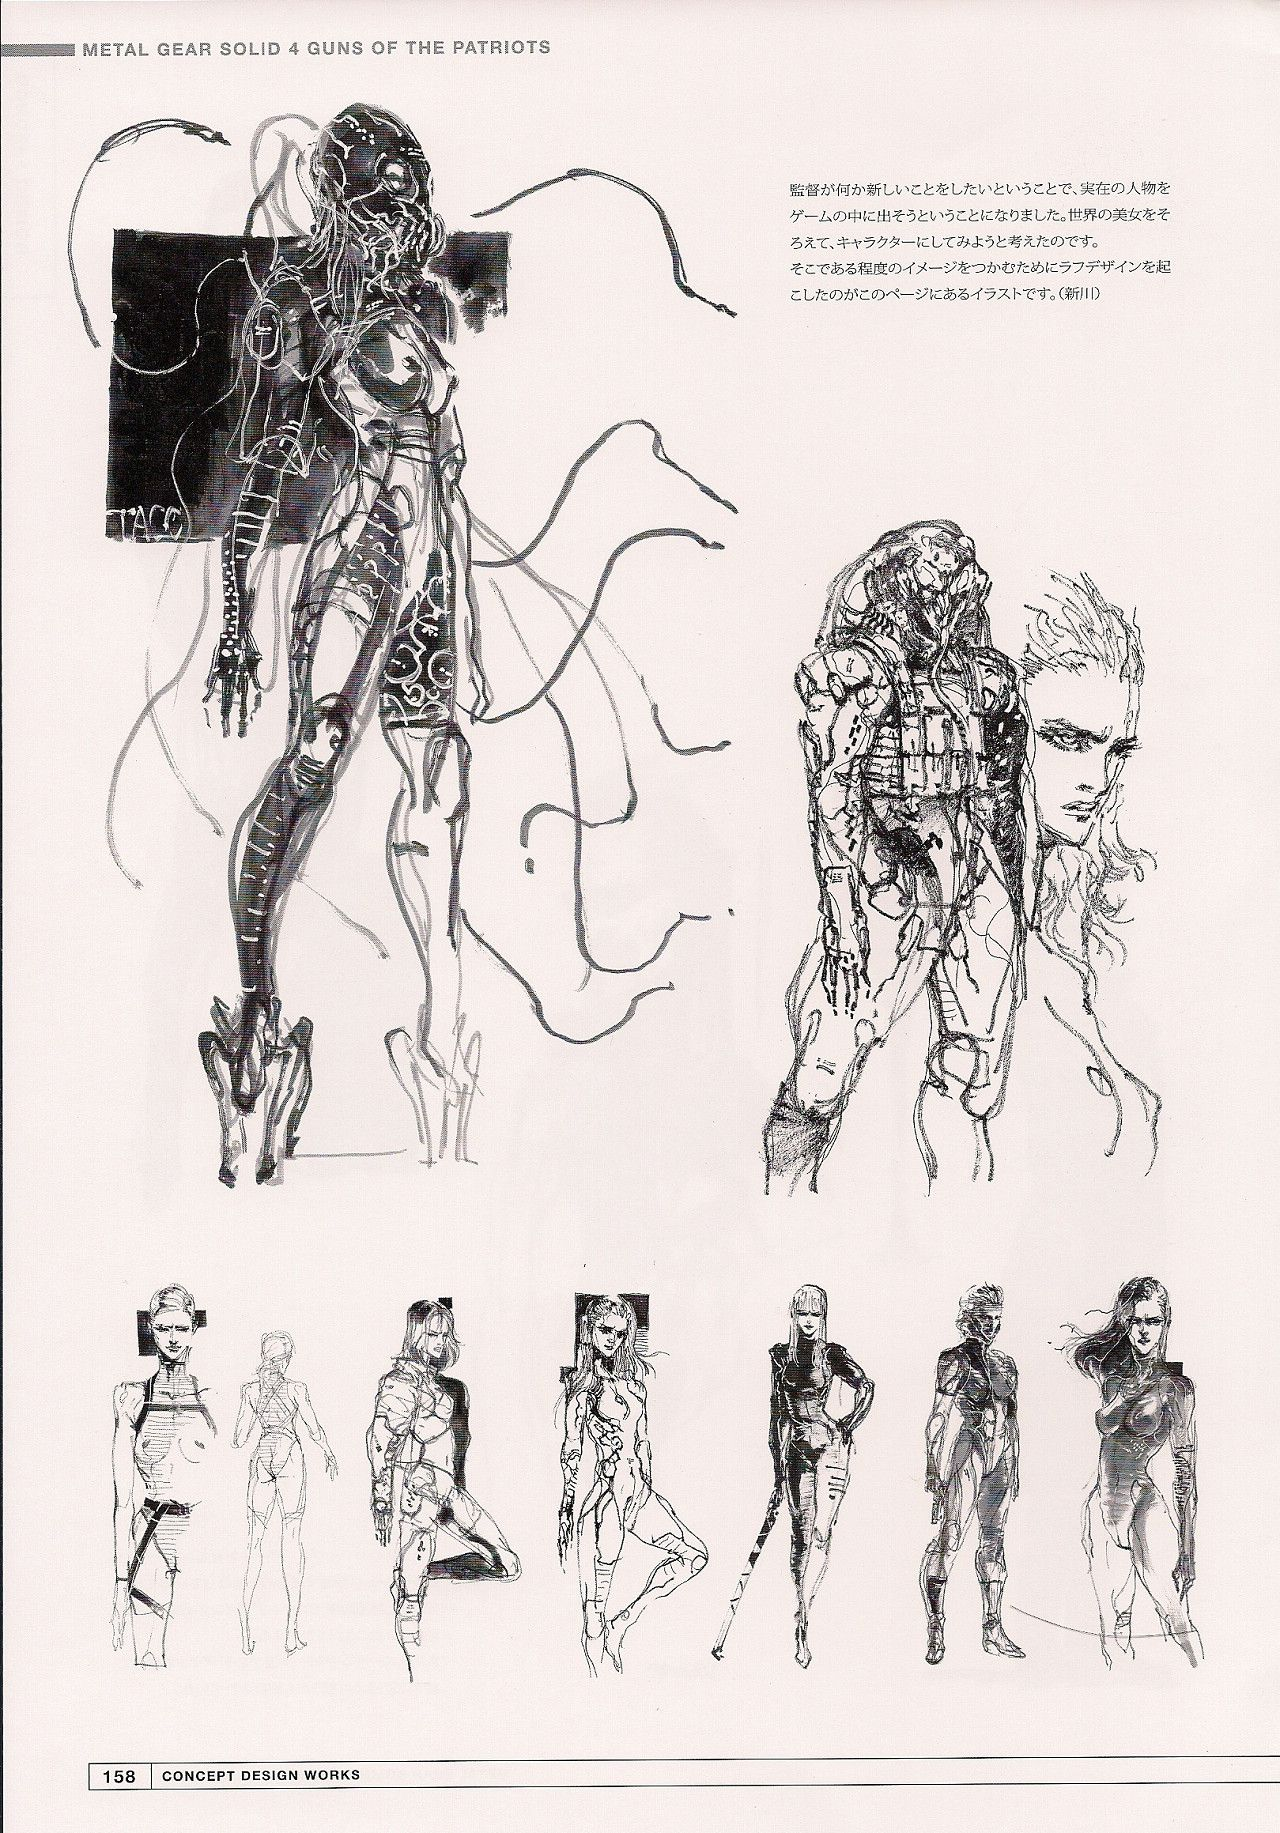 Mgs4 Concept Art